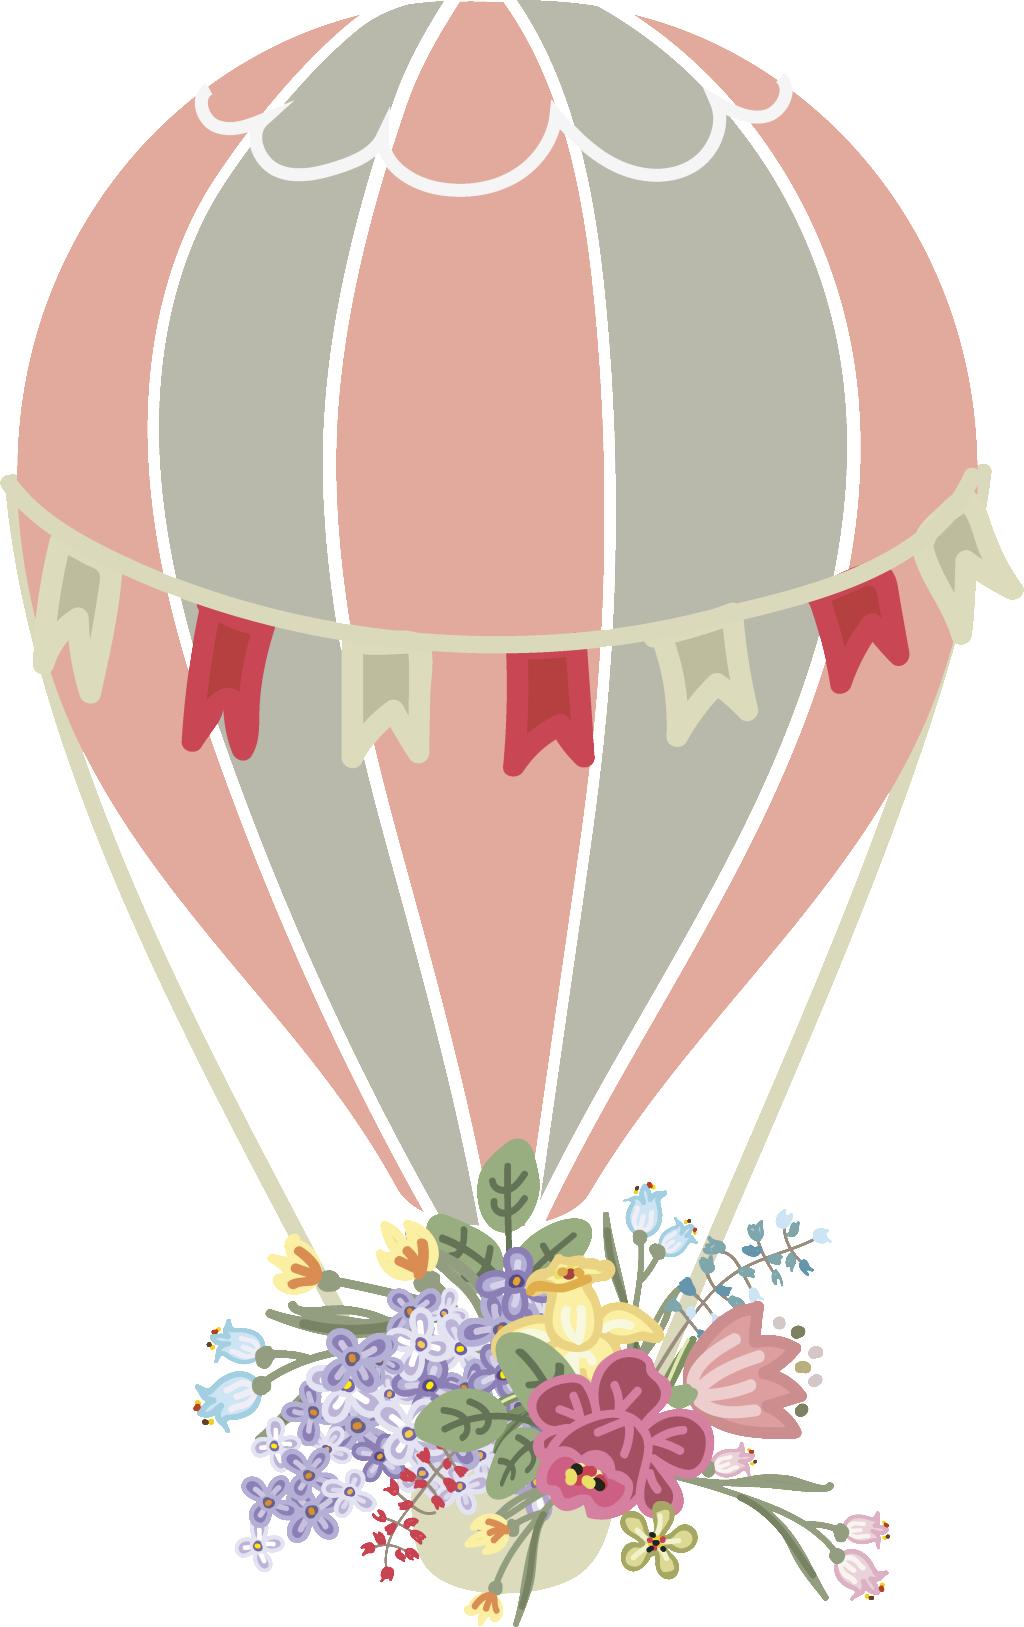 clip art freeuse download Hot air flower wedding. Baloon vector watercolor